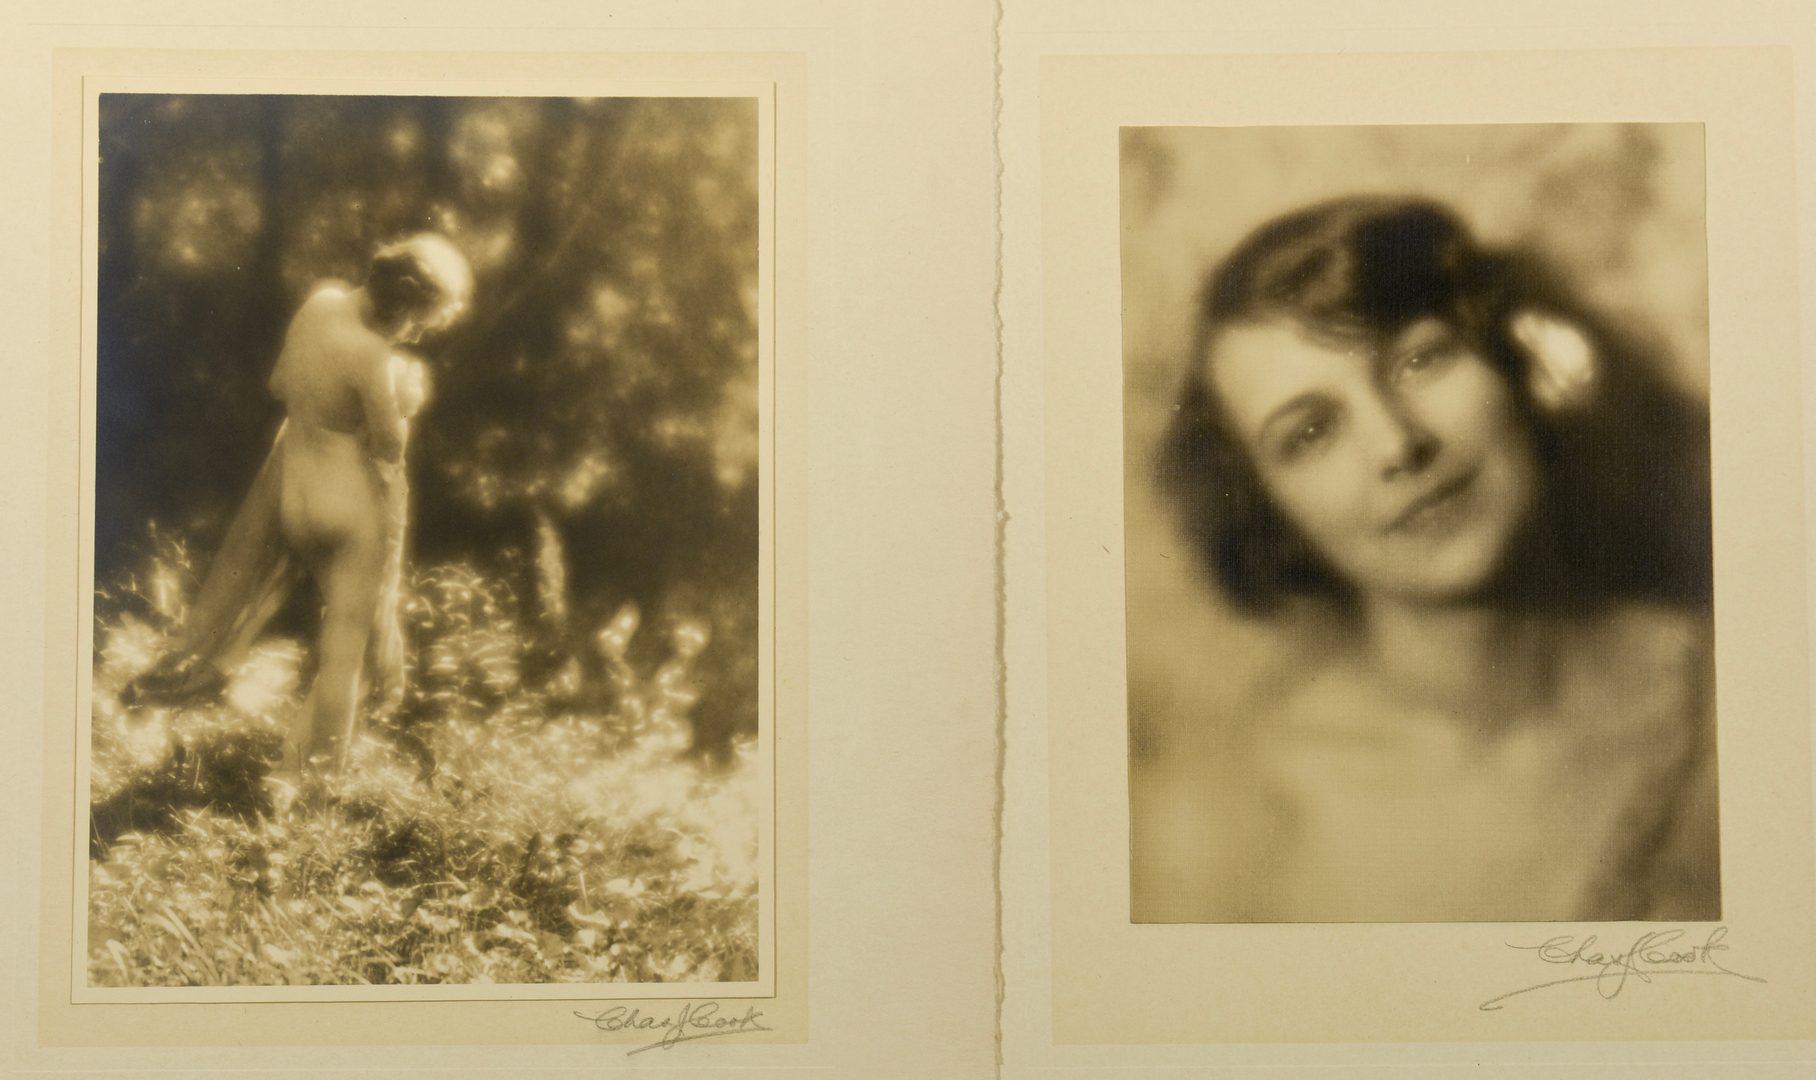 Lot 762: 7 Charlie Cook Gelatin Prints, inc. Nude